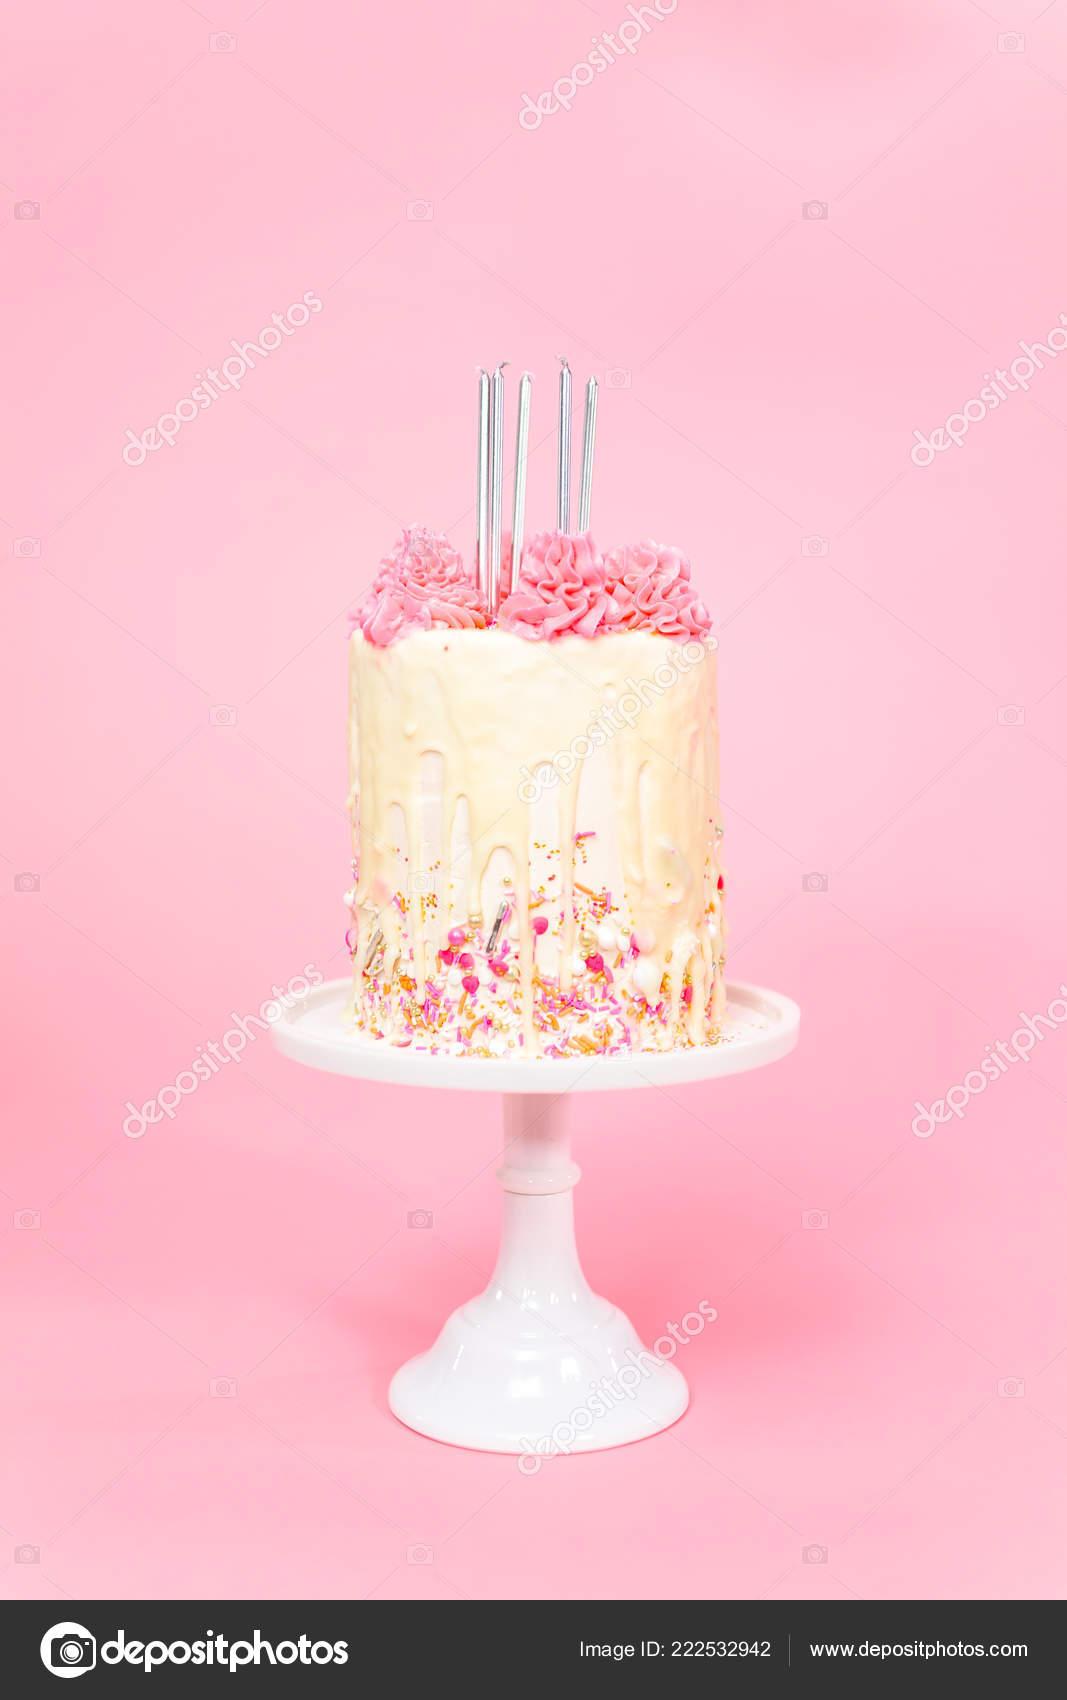 Five Birthday Candles Pink White Buttercream Cream Cake Sprinkles Stock Photo